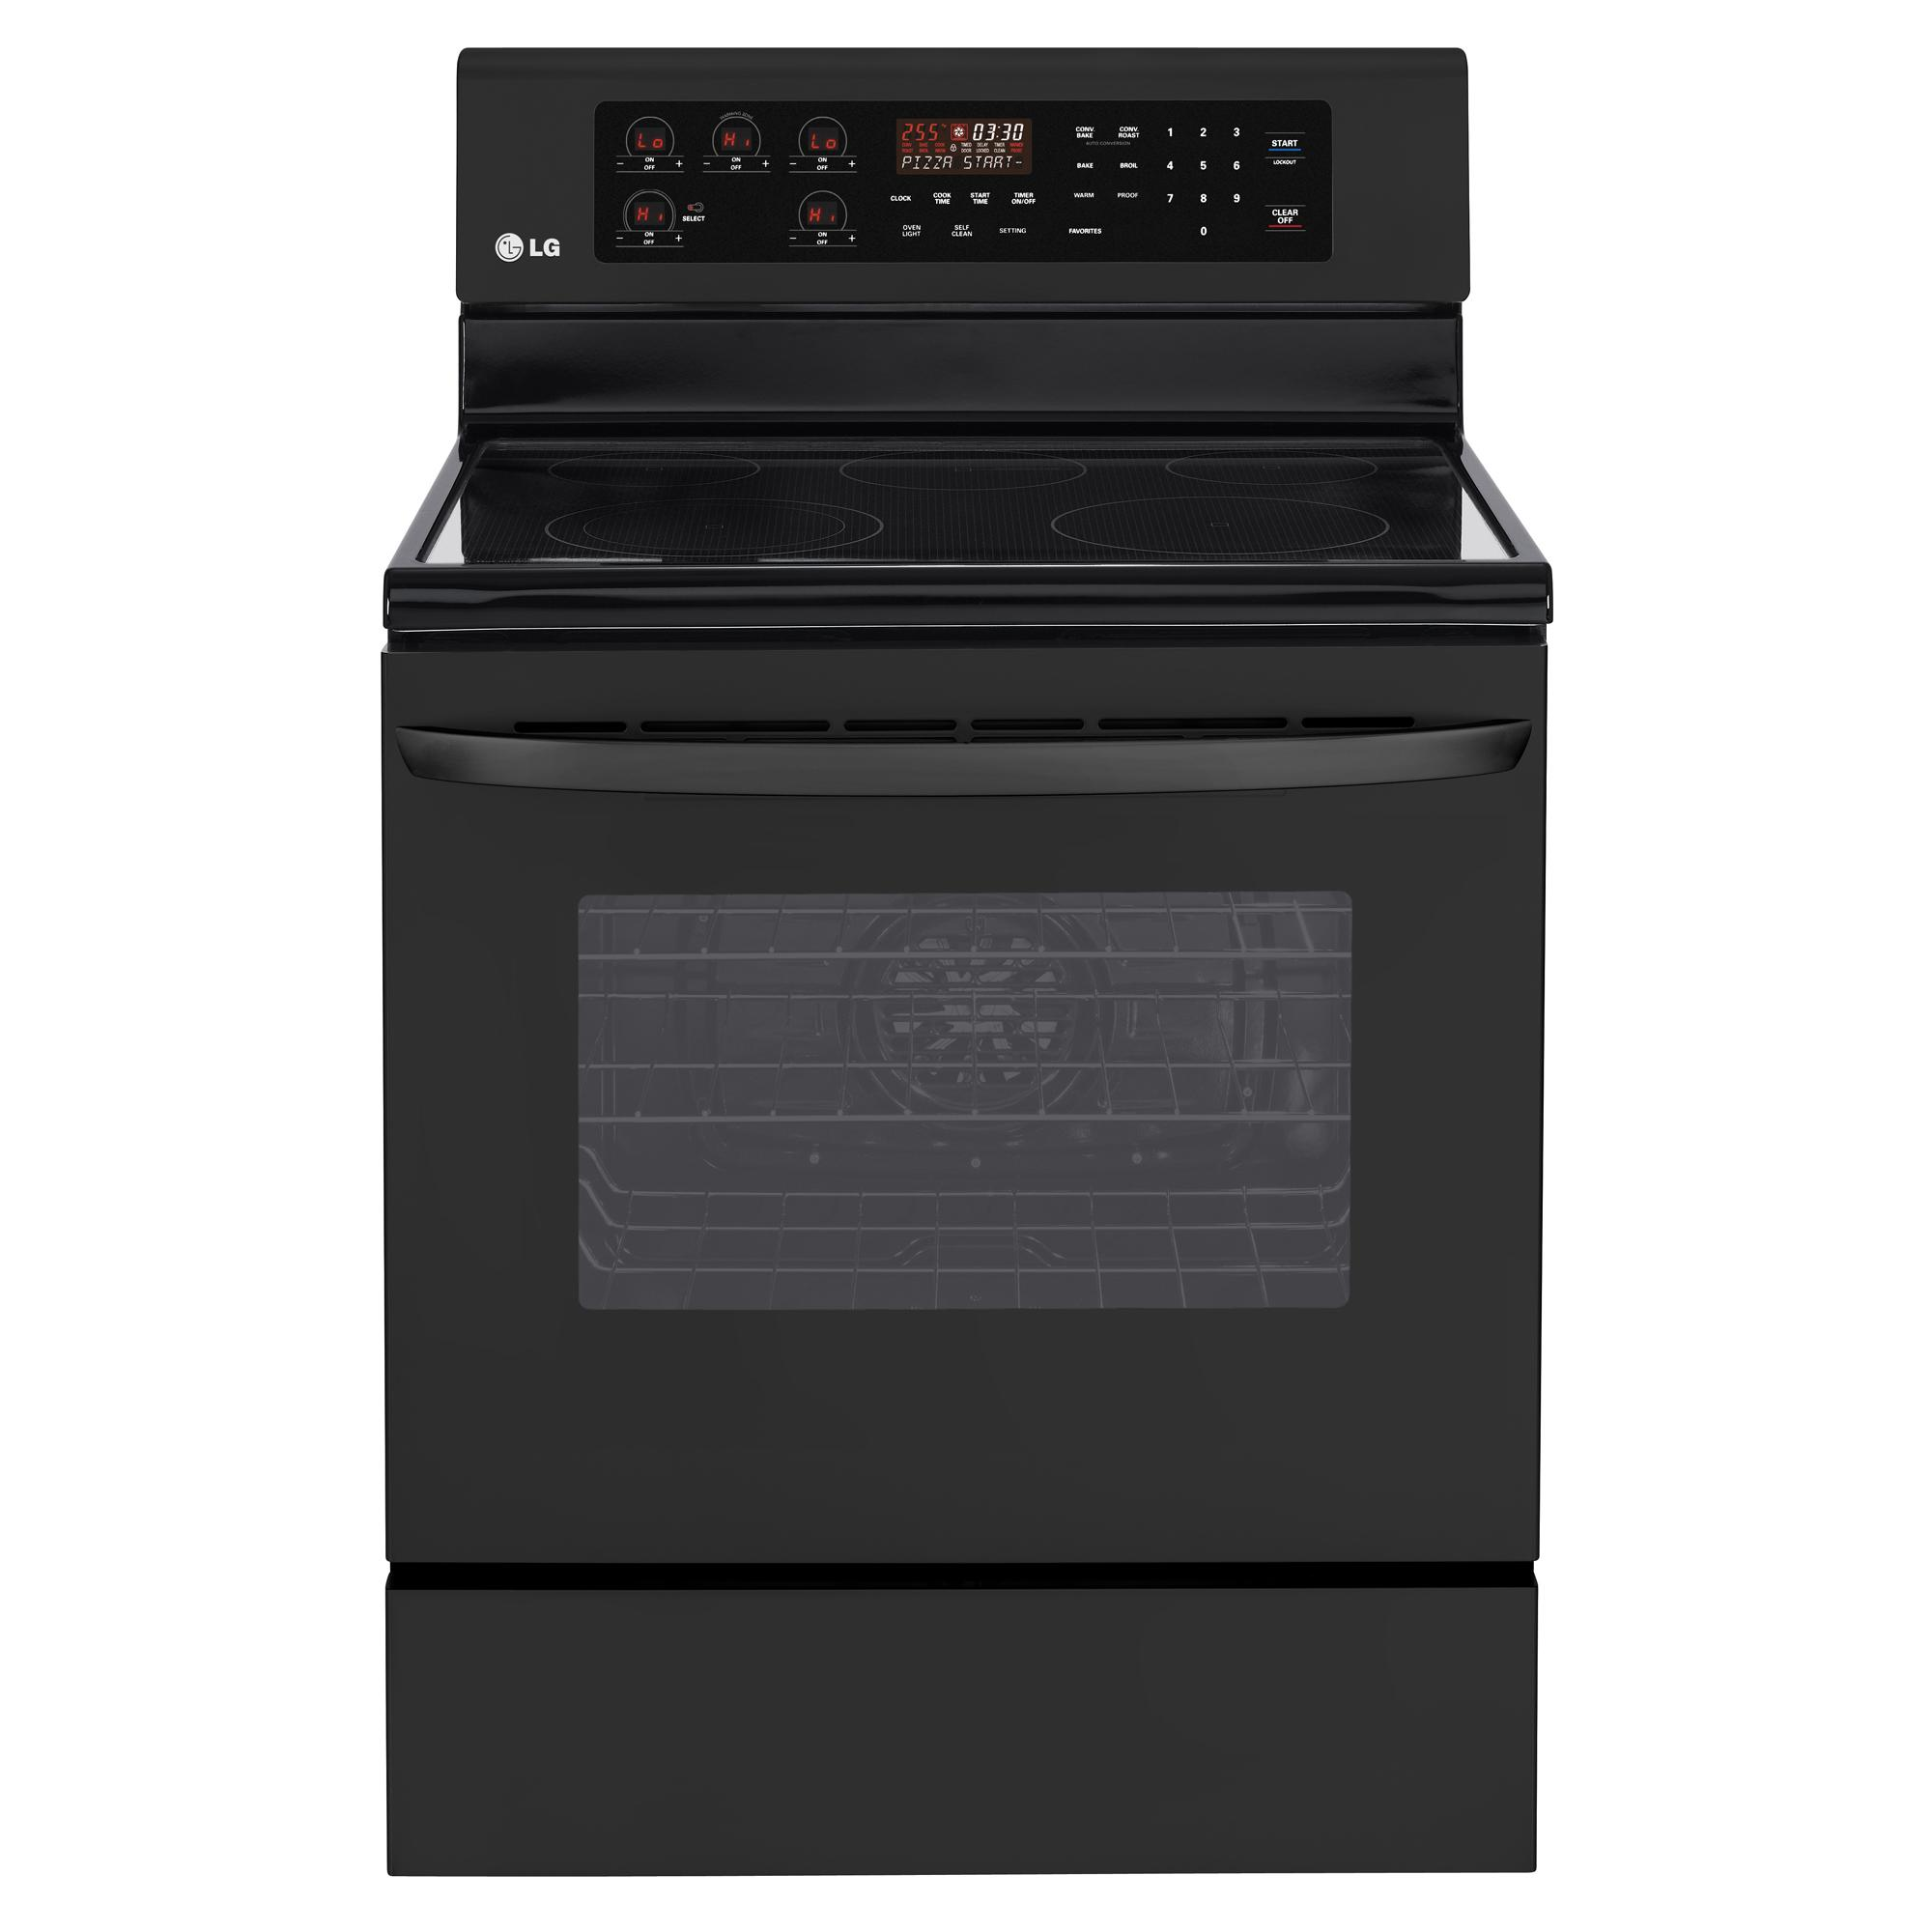 "LG Appliances Electric Ranges 30"" Freestanding Electric Range - Item Number: LRE3083SB"